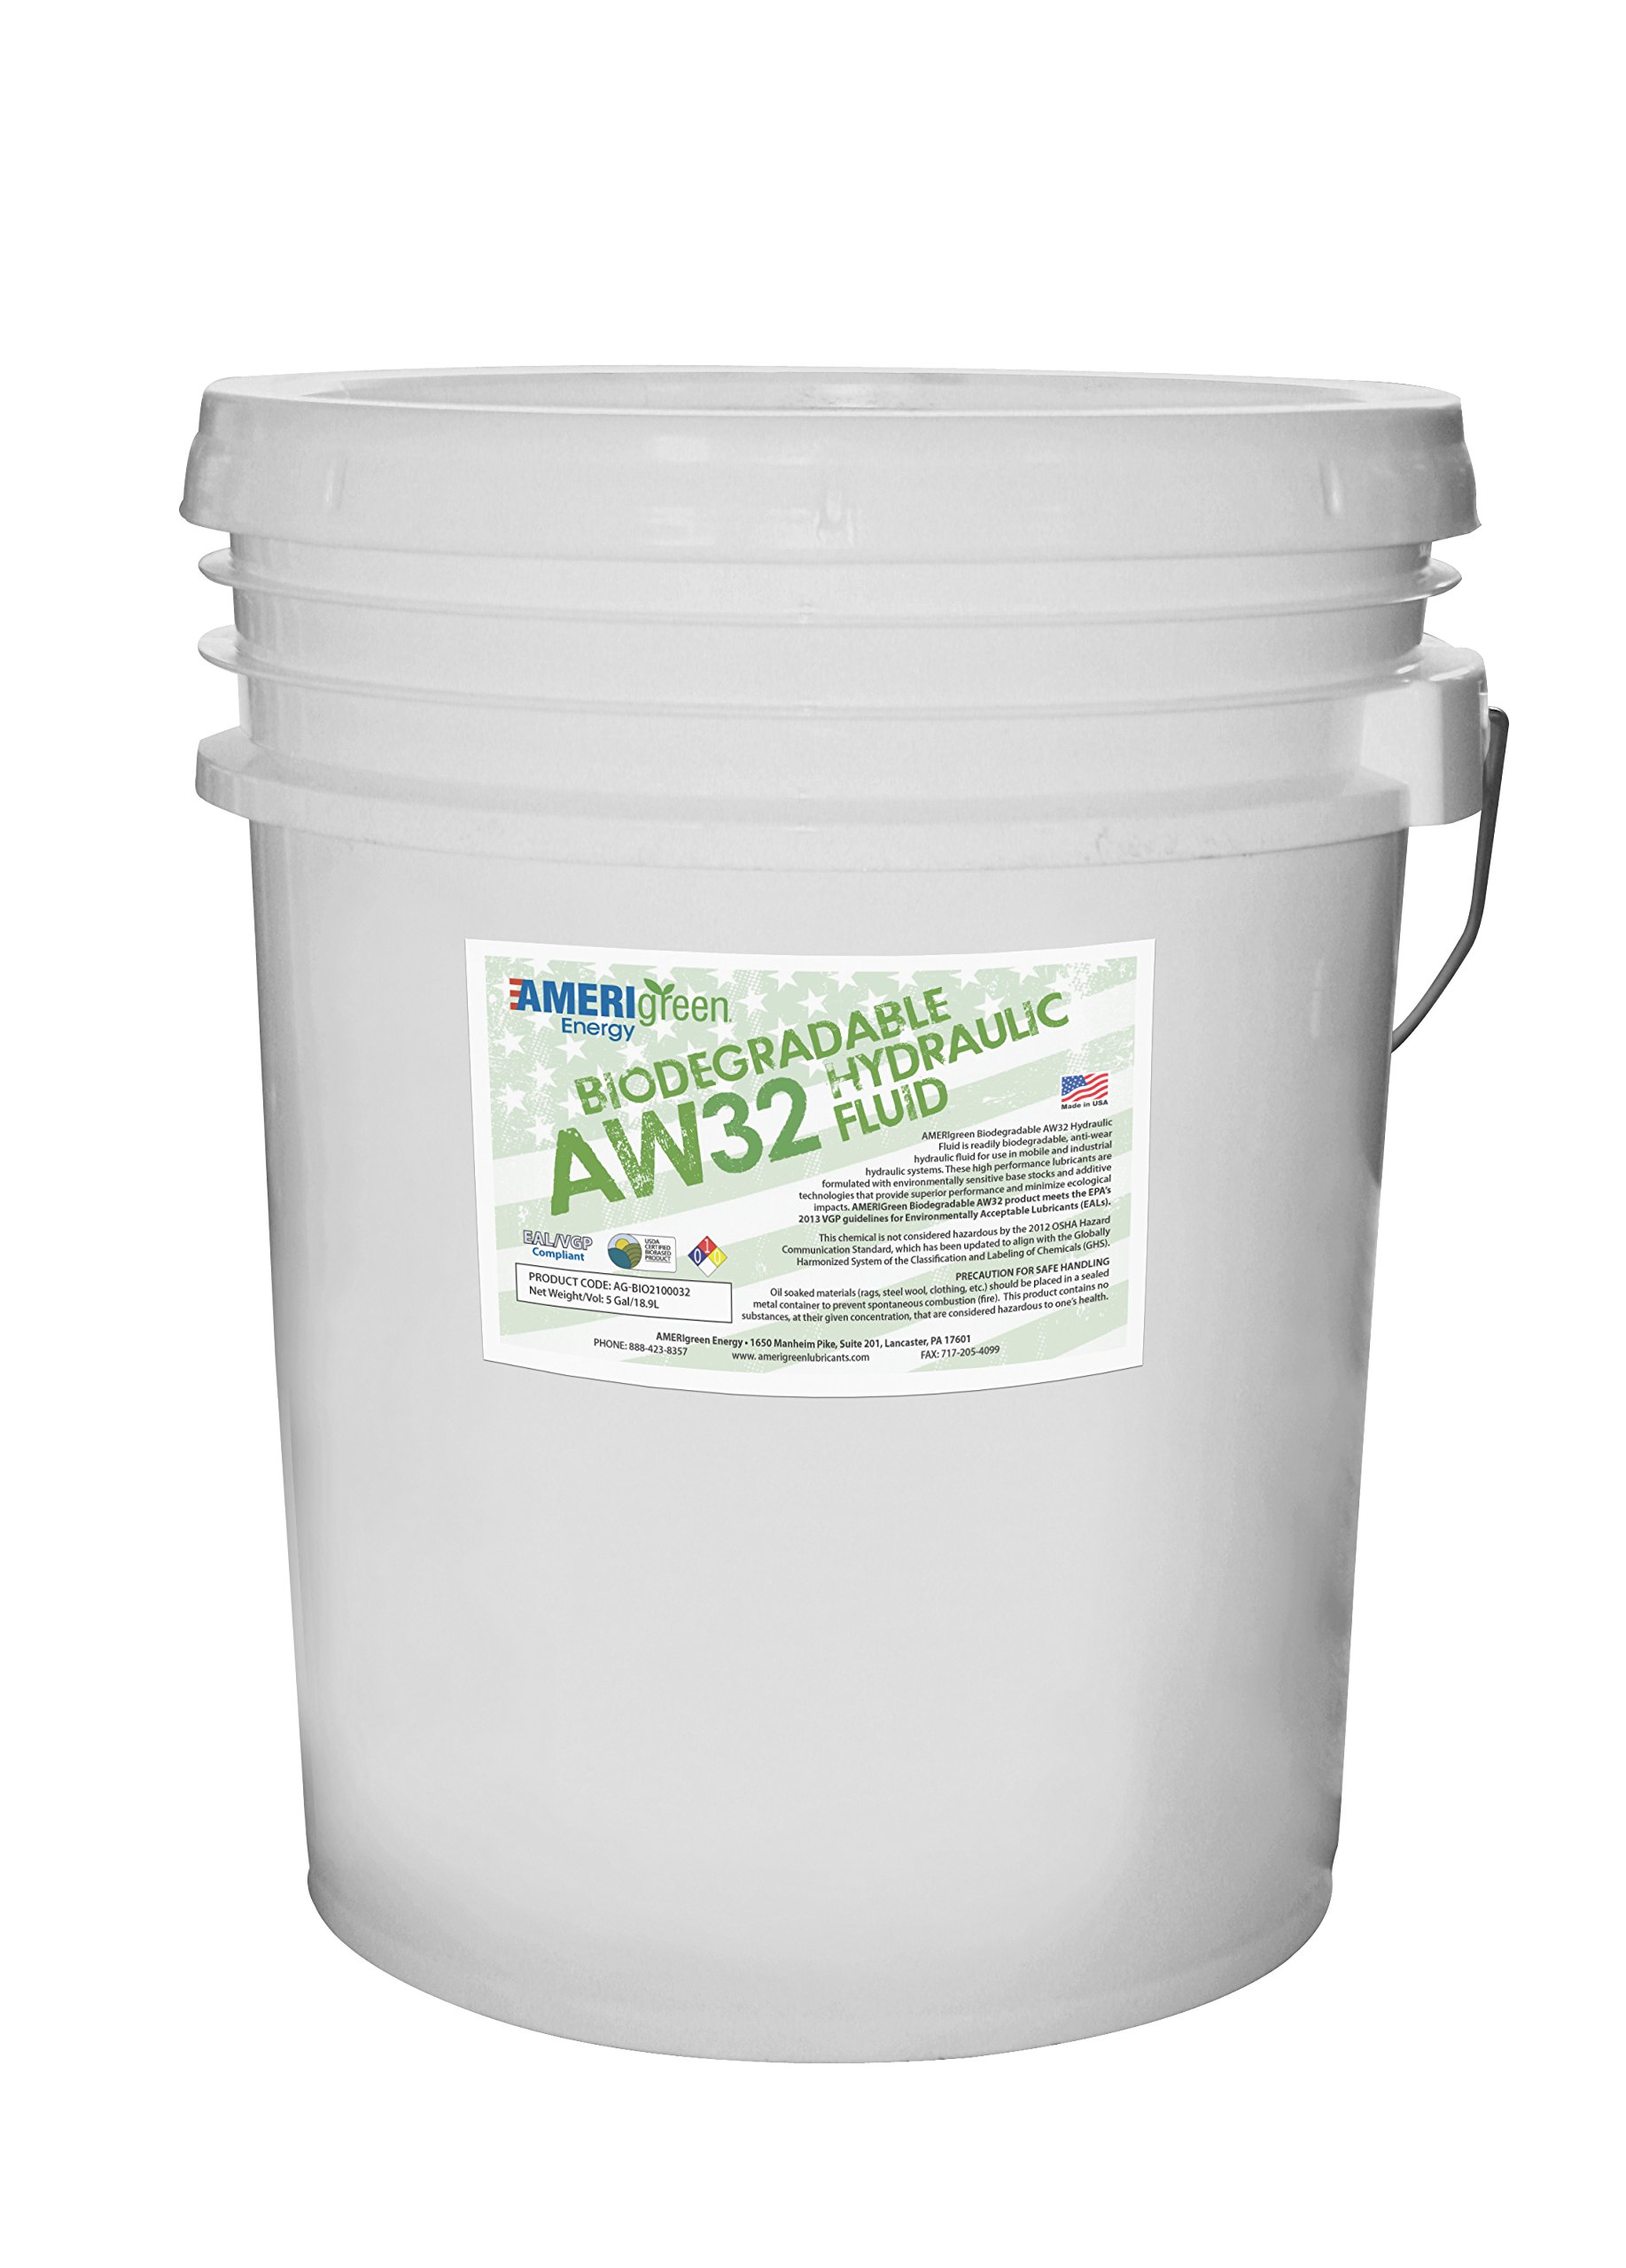 Amerigreen Energy Biodegradable Hydraulic Fluid AW32 (5 Gal Pail) by Amerigreen Energy